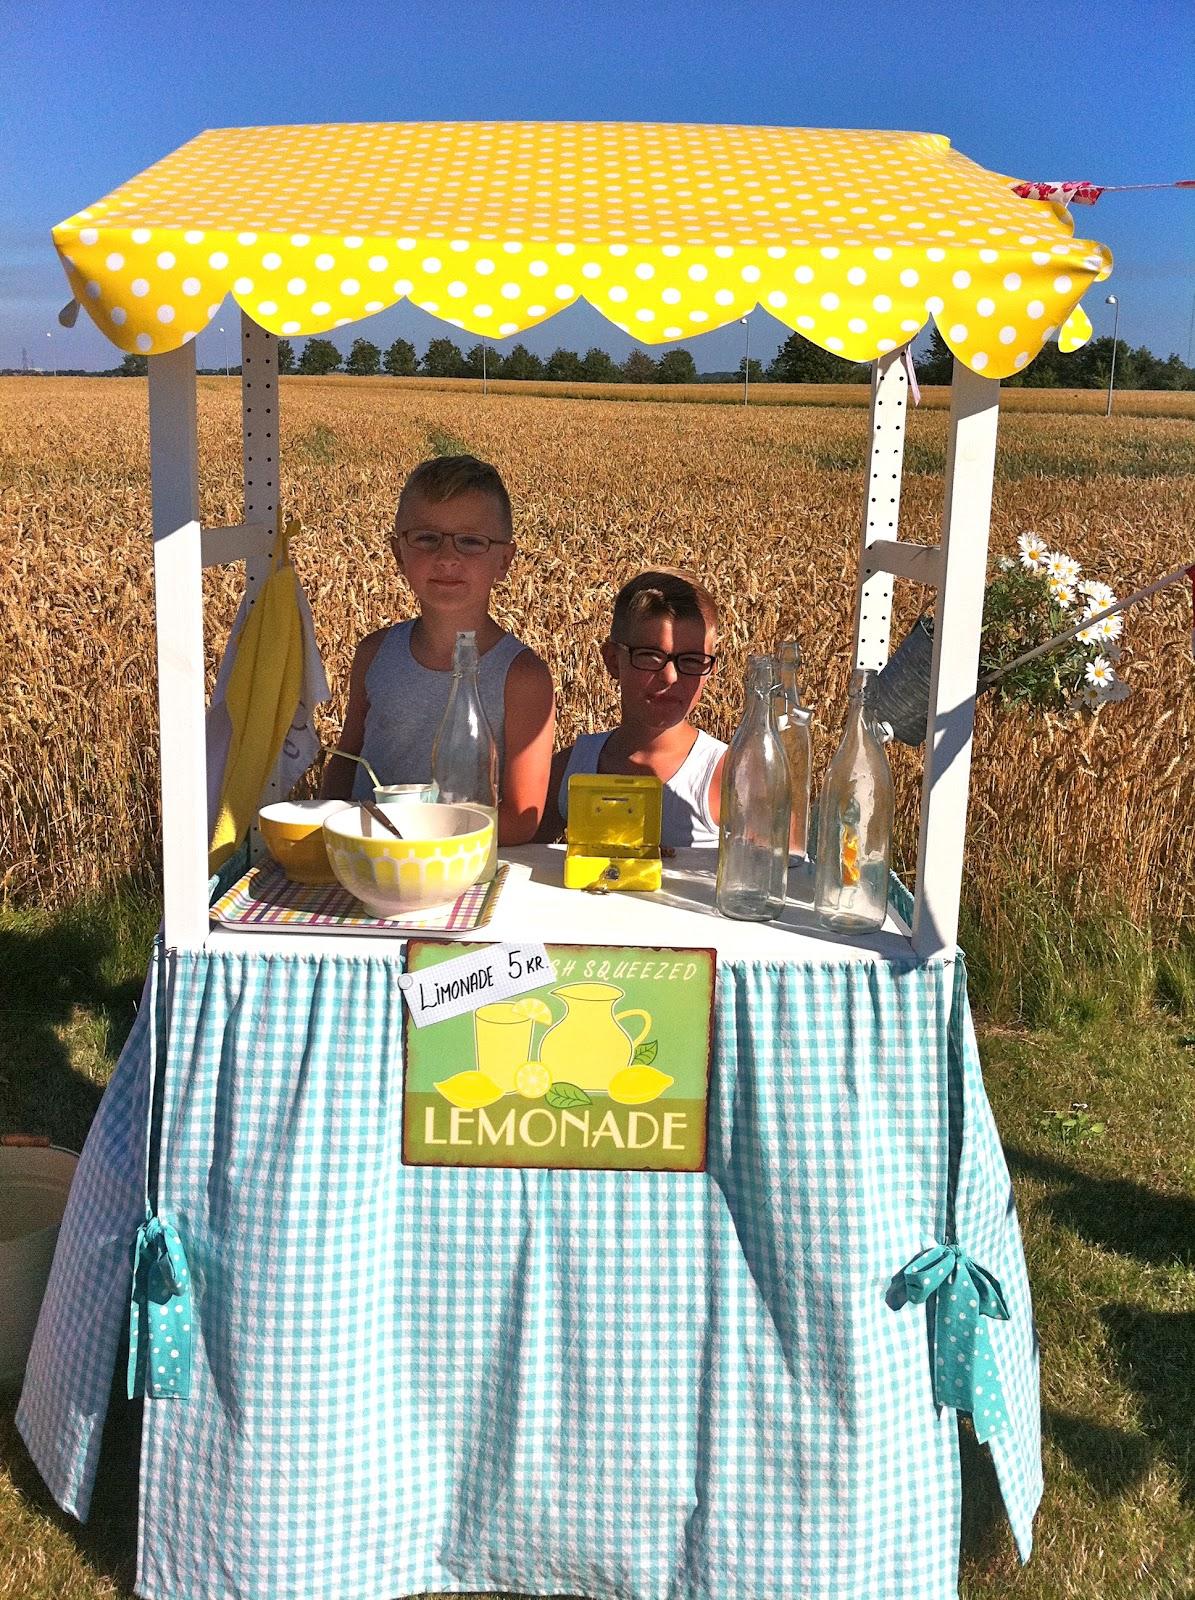 Vores limonade-bod